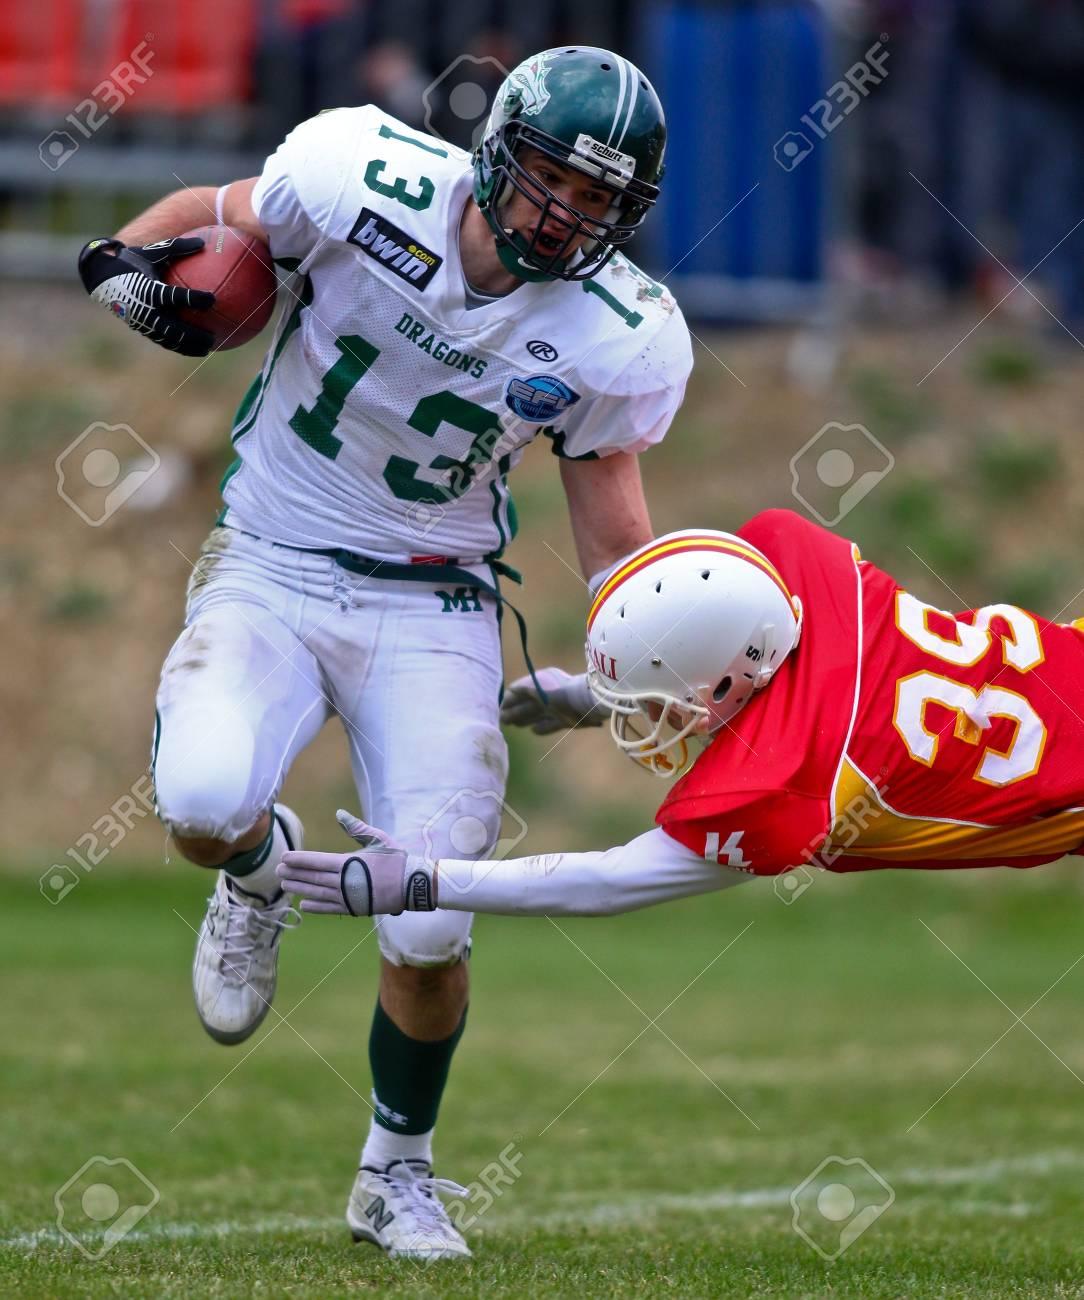 KORNEUBURG, AUSTRIA - APRIL 10 Danube Dragons beat St. Poelten Invaders in an AFL-season game 63-55 on April 10, 2010. Shown is WR Thomas Haider (Dragons #13). Stock Photo - 8465286